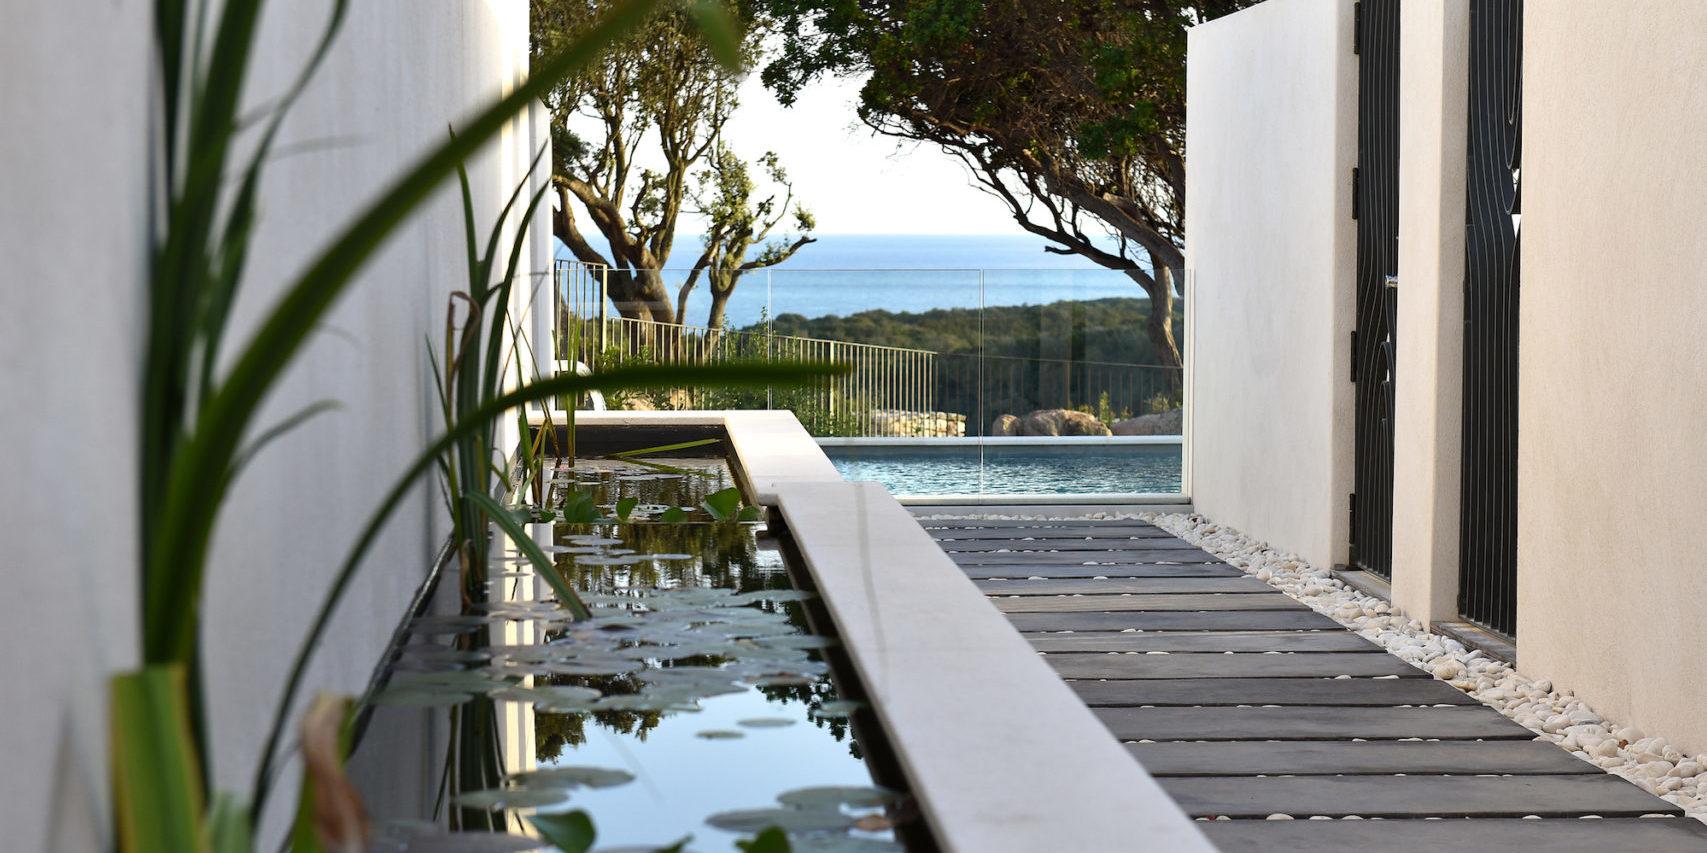 Hotel Cala di Greco Bonifacio Corsica Zuid-Corsica Frankrijk doorkijkje